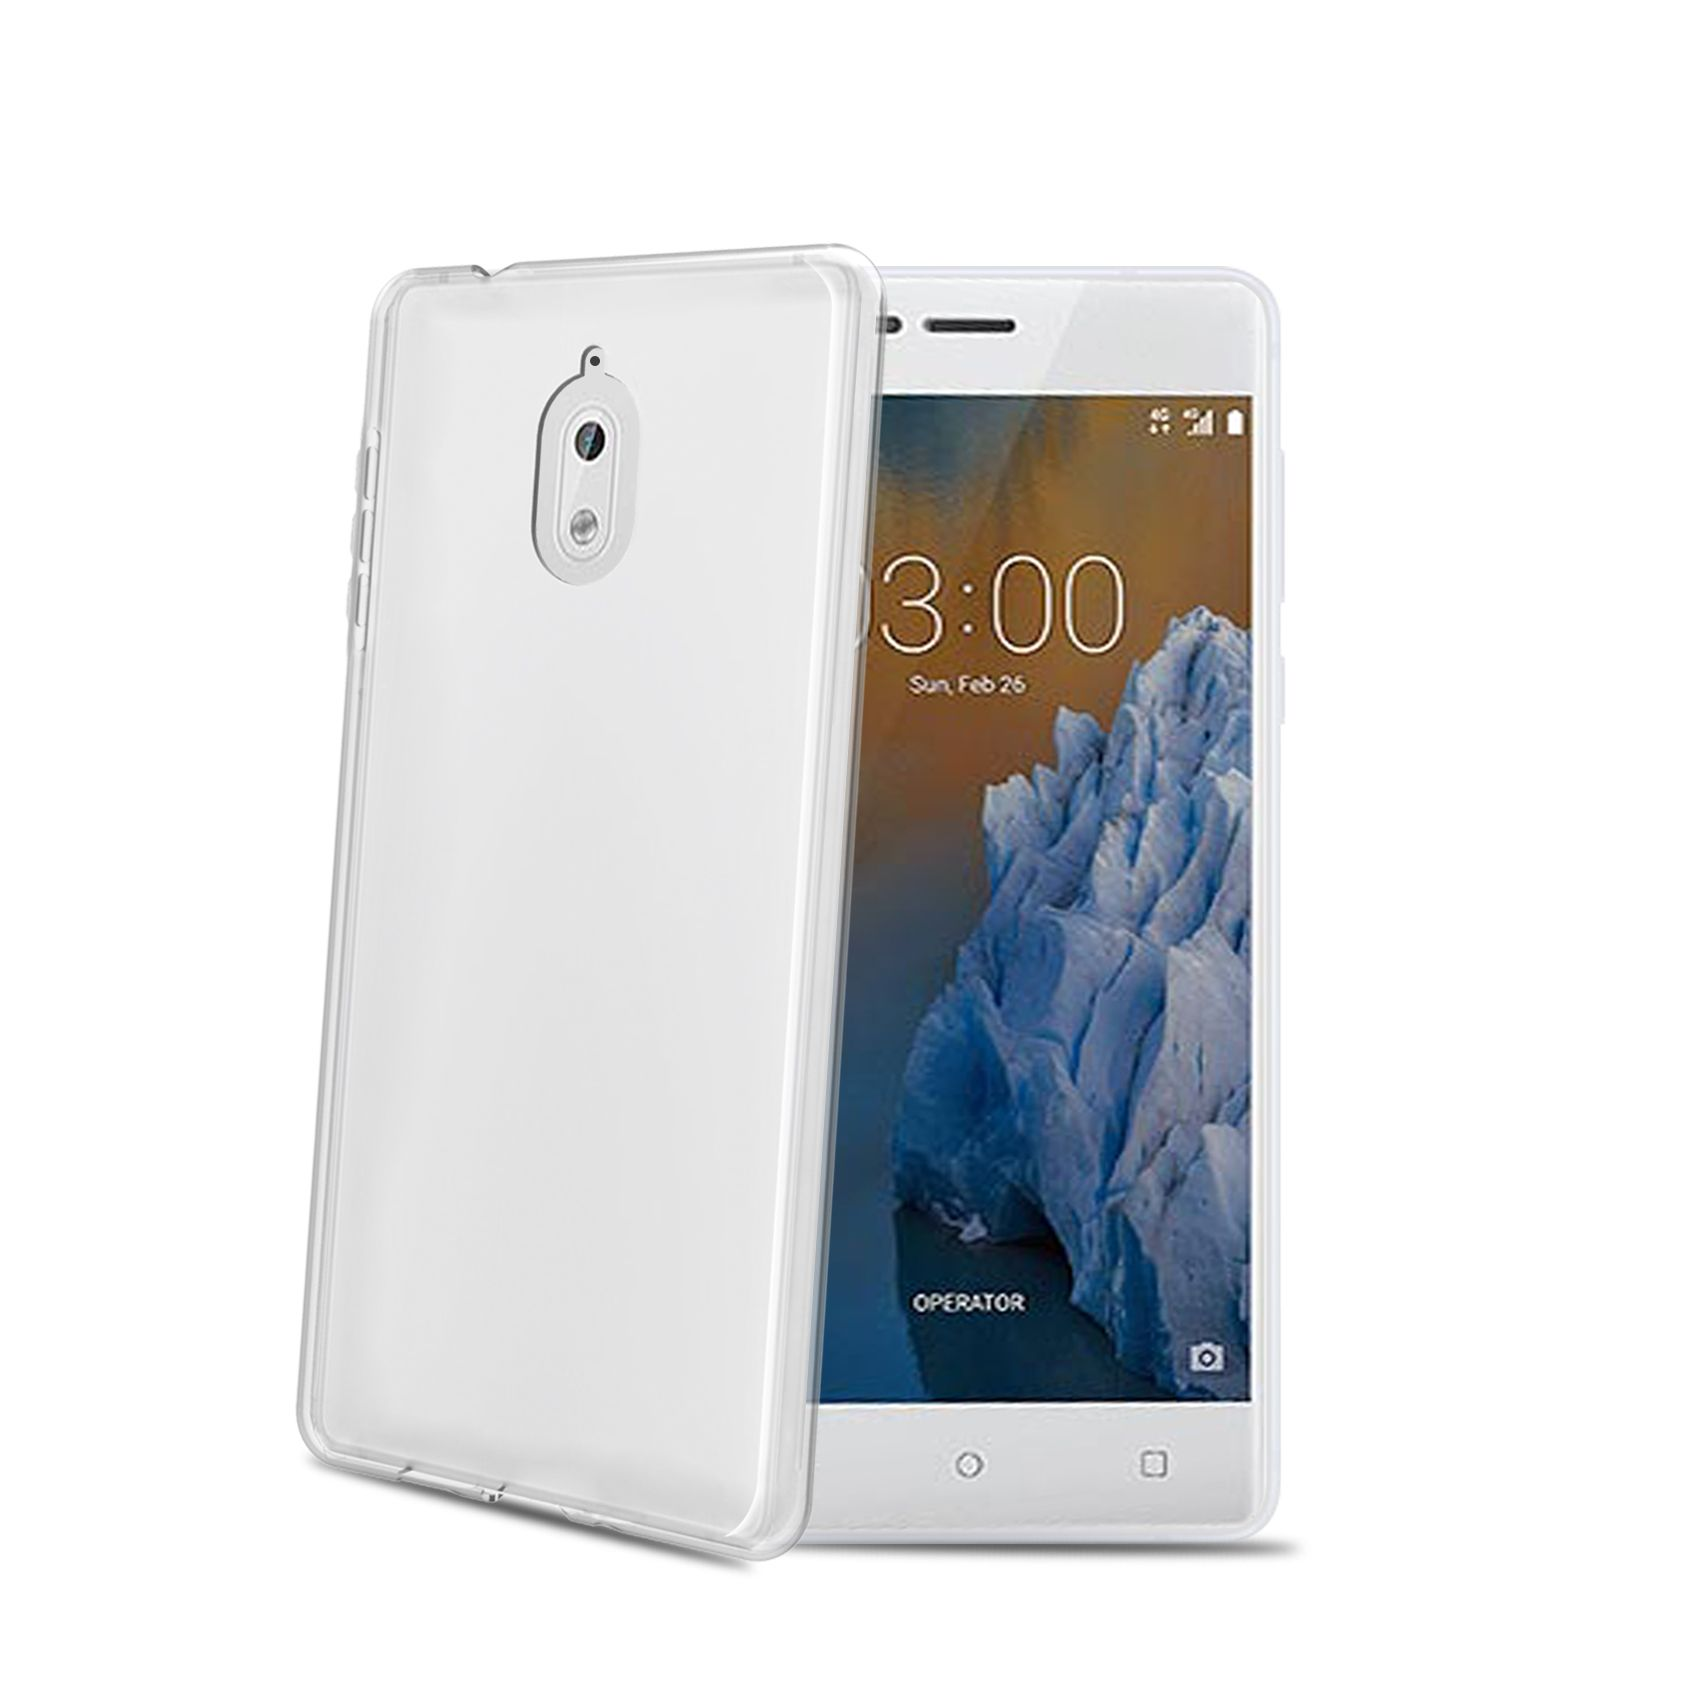 TPU pouzdro CELLY Gelskin pro Nokia 3.1/Nokia 3 (2018), bezbarvé